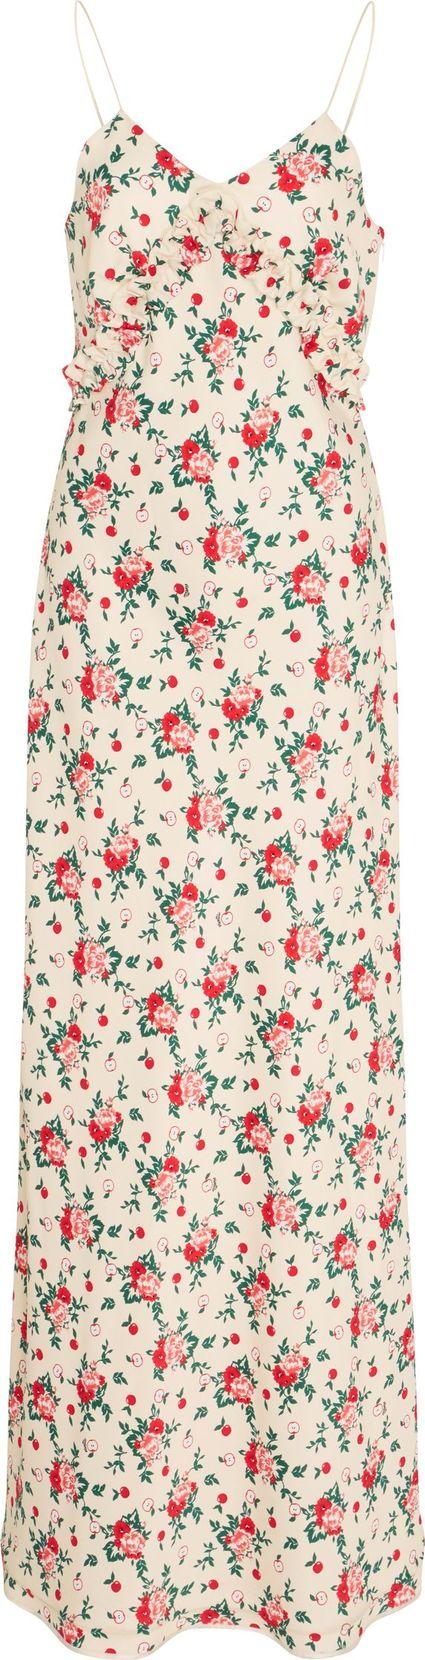 Vivetta Bariki Floral Slip Dress with Neck Tie